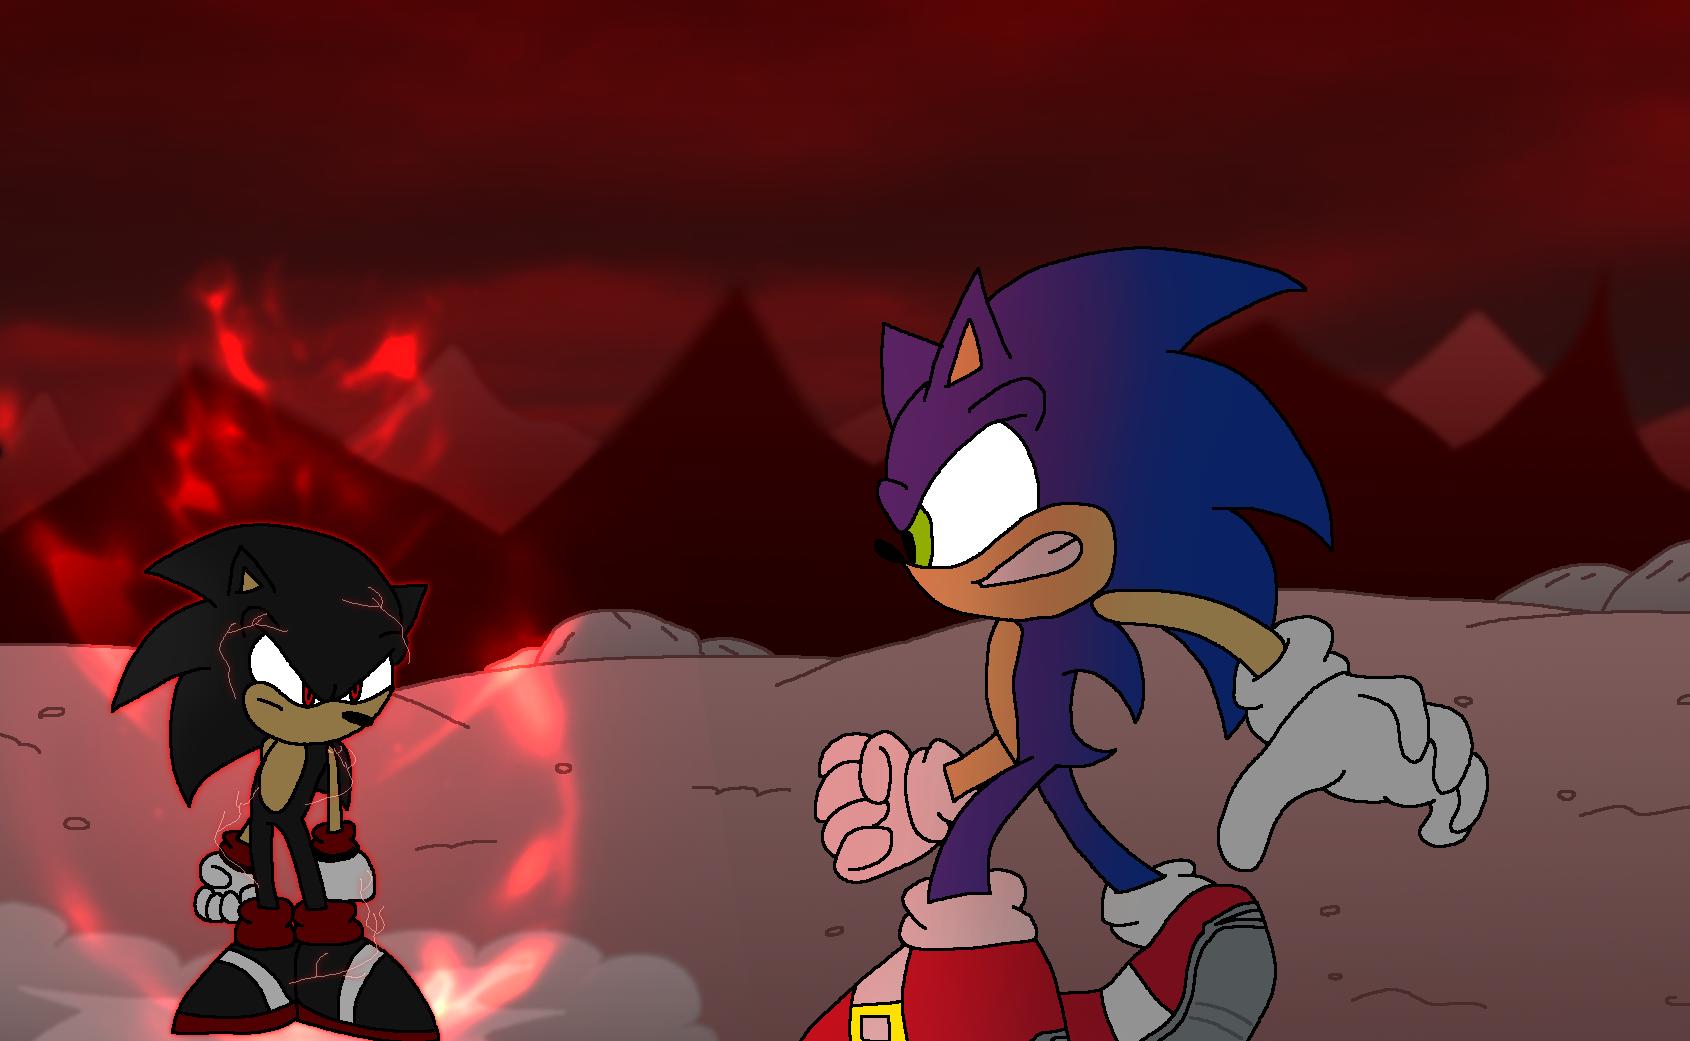 Sonic Vs Evil Sonic By Jack Hedgehog On Deviantart